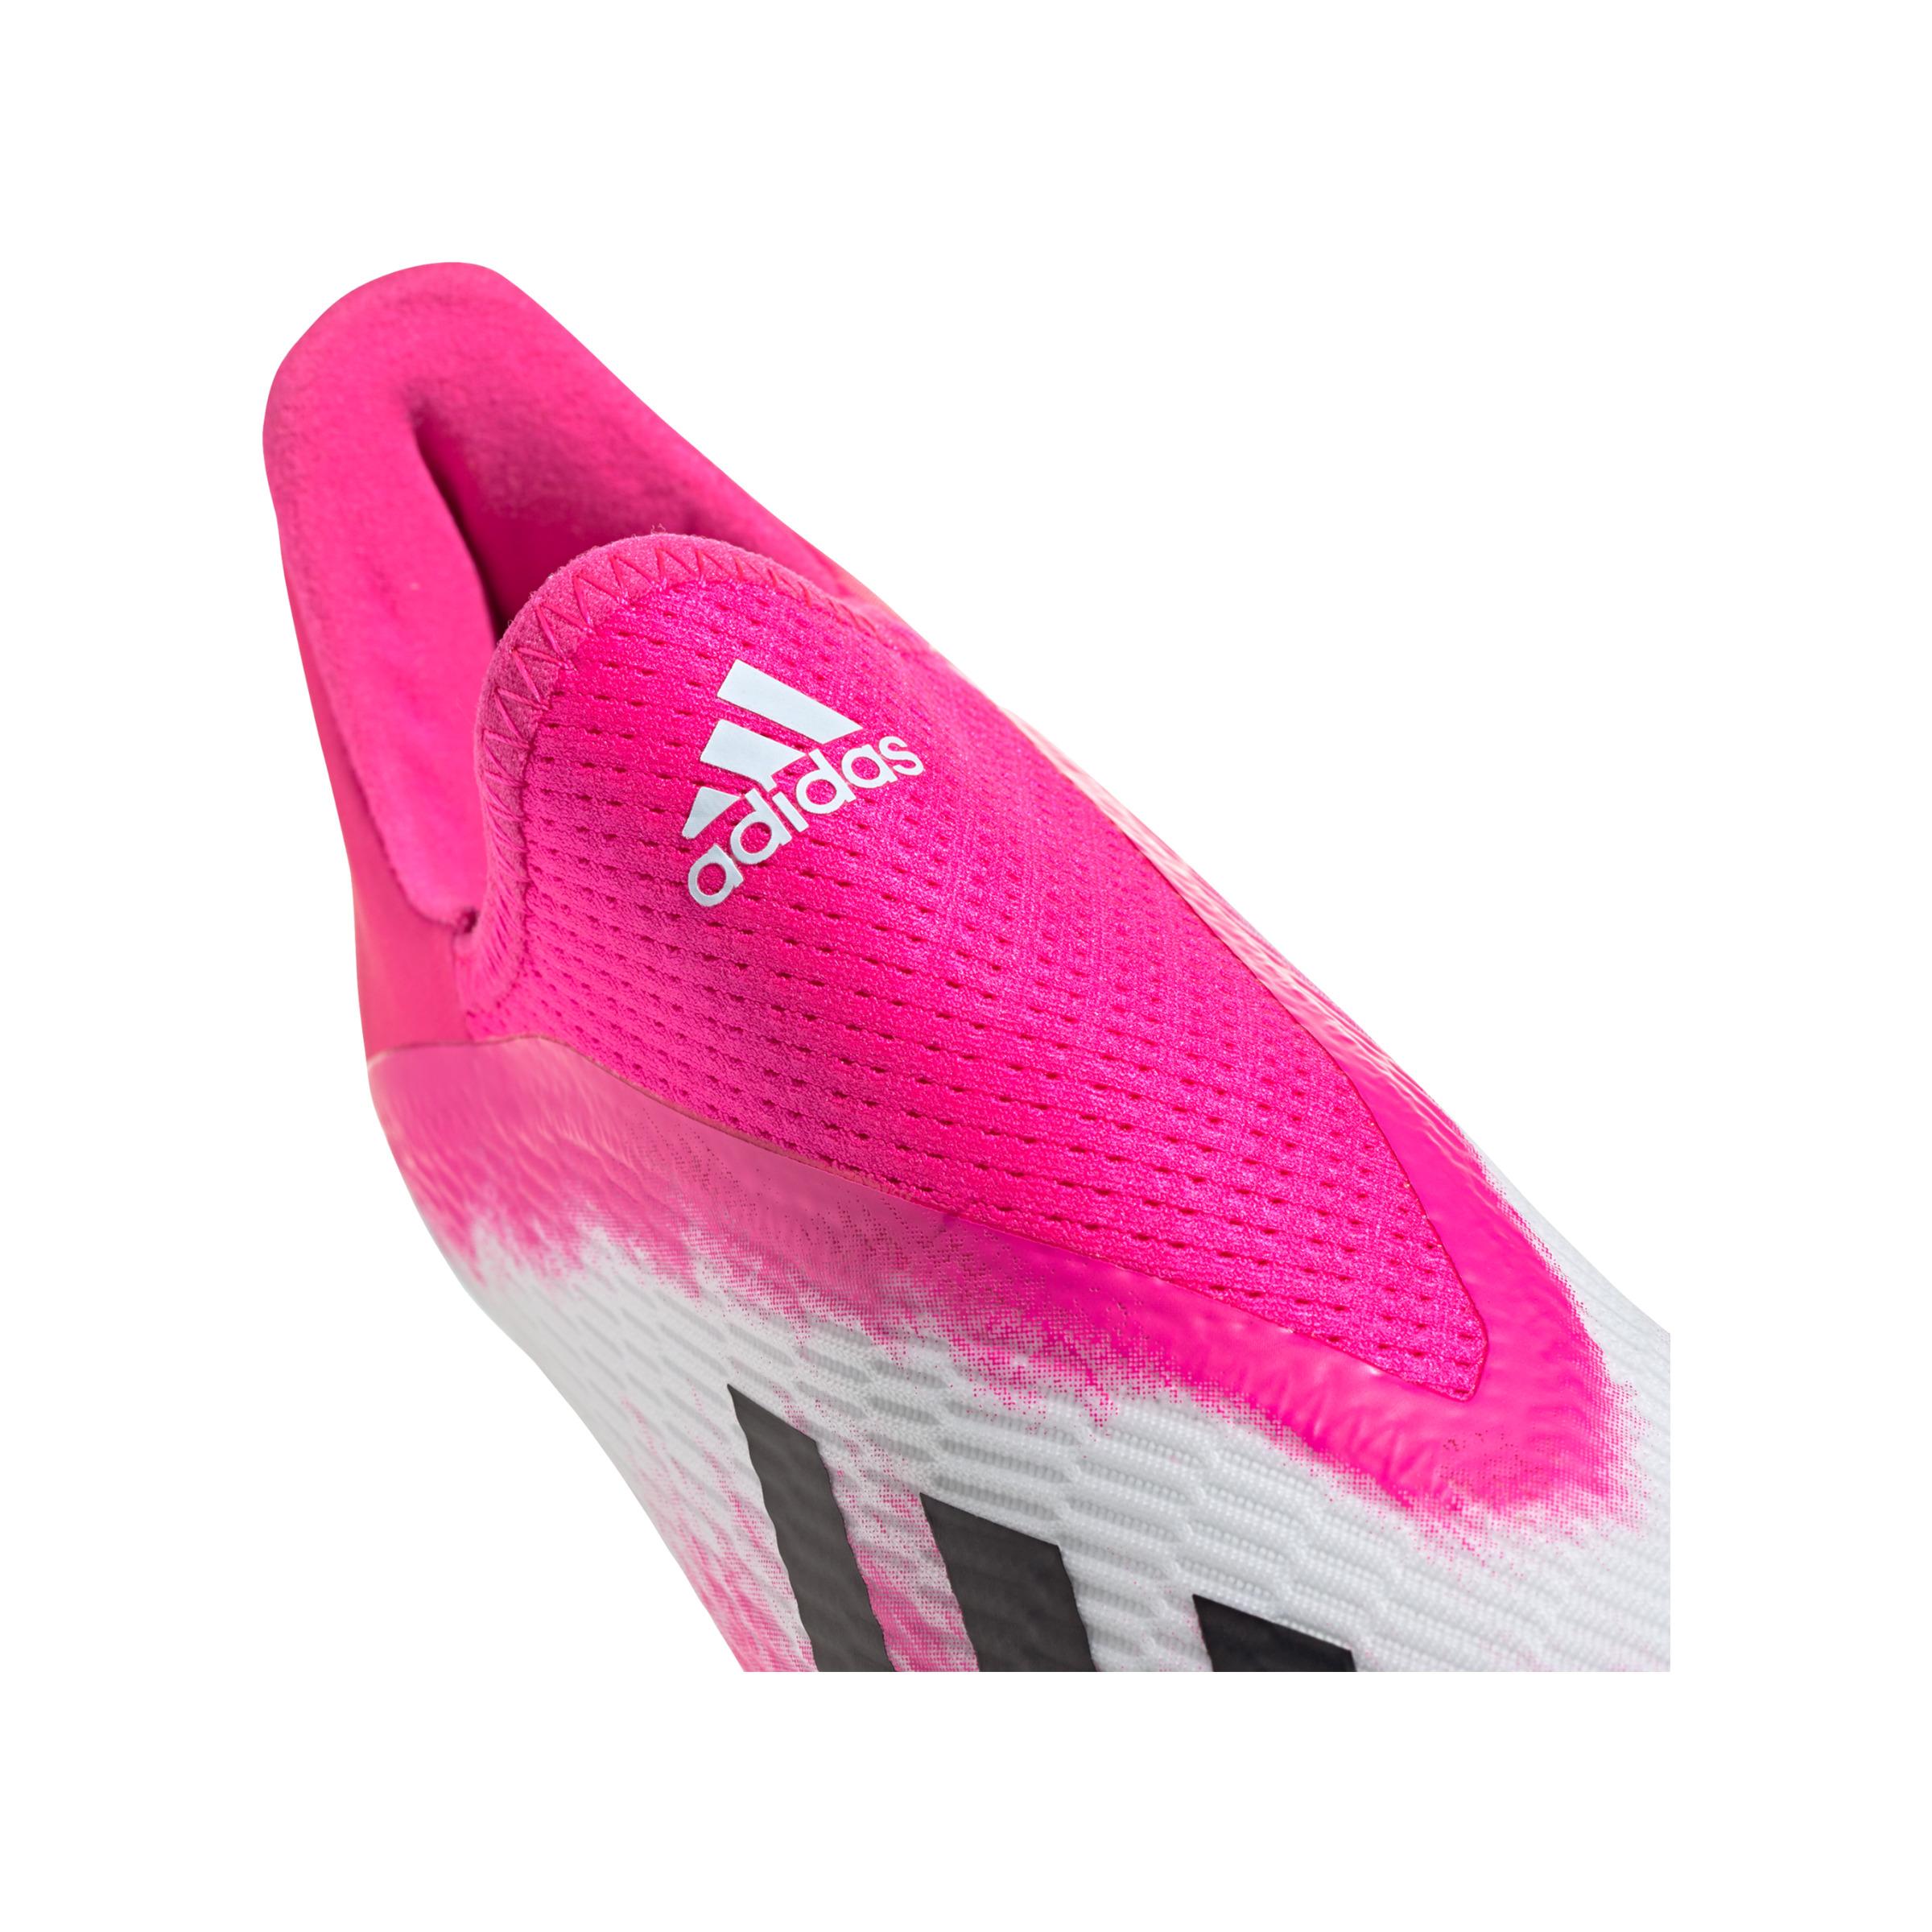 Adidas X uniforia 19.3 ll FG J Kids blanc pink